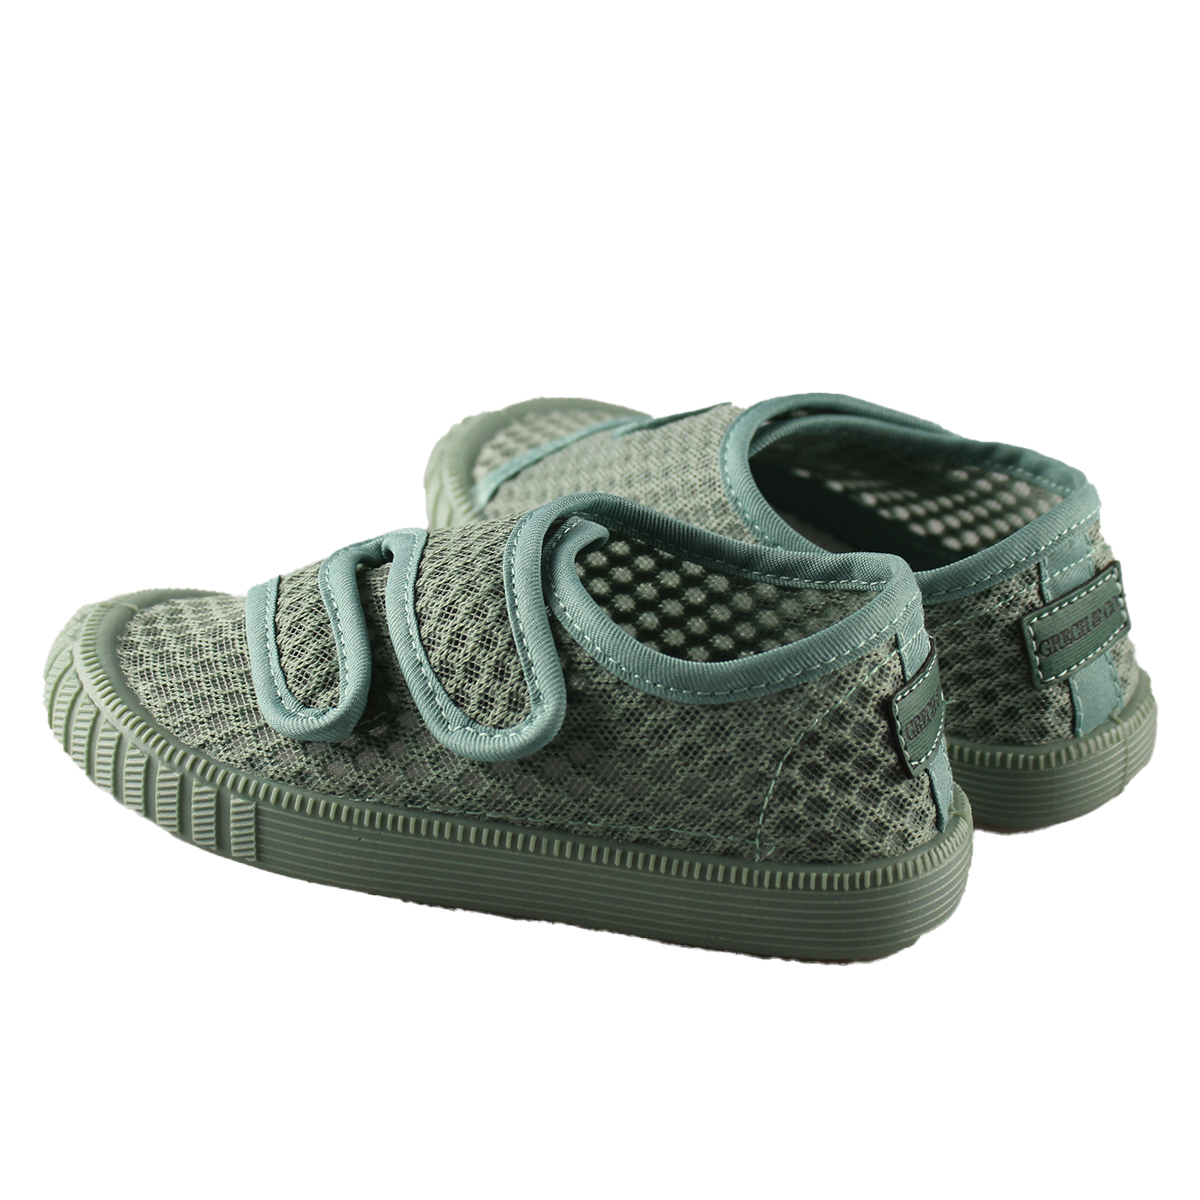 Chaussons & Chaussures Baskets Respirantes à Scratch Fern - 27 Baskets Respirantes à Scratch Fern - 27